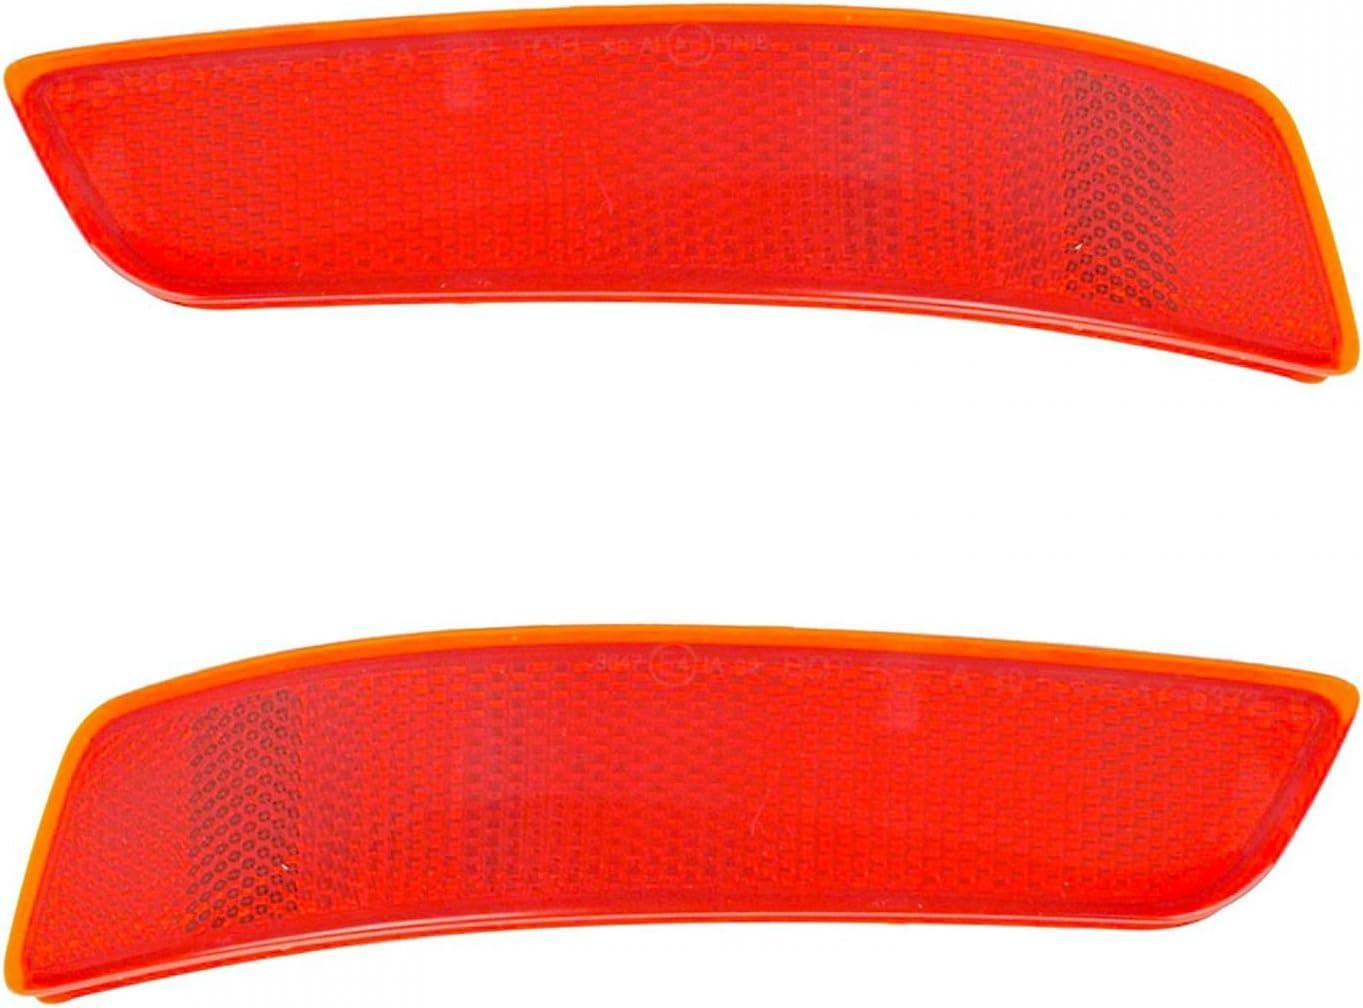 Rear Bumper Reflector Passenger Side Right RH for 13 ES300H ES350 GS350 GS450H